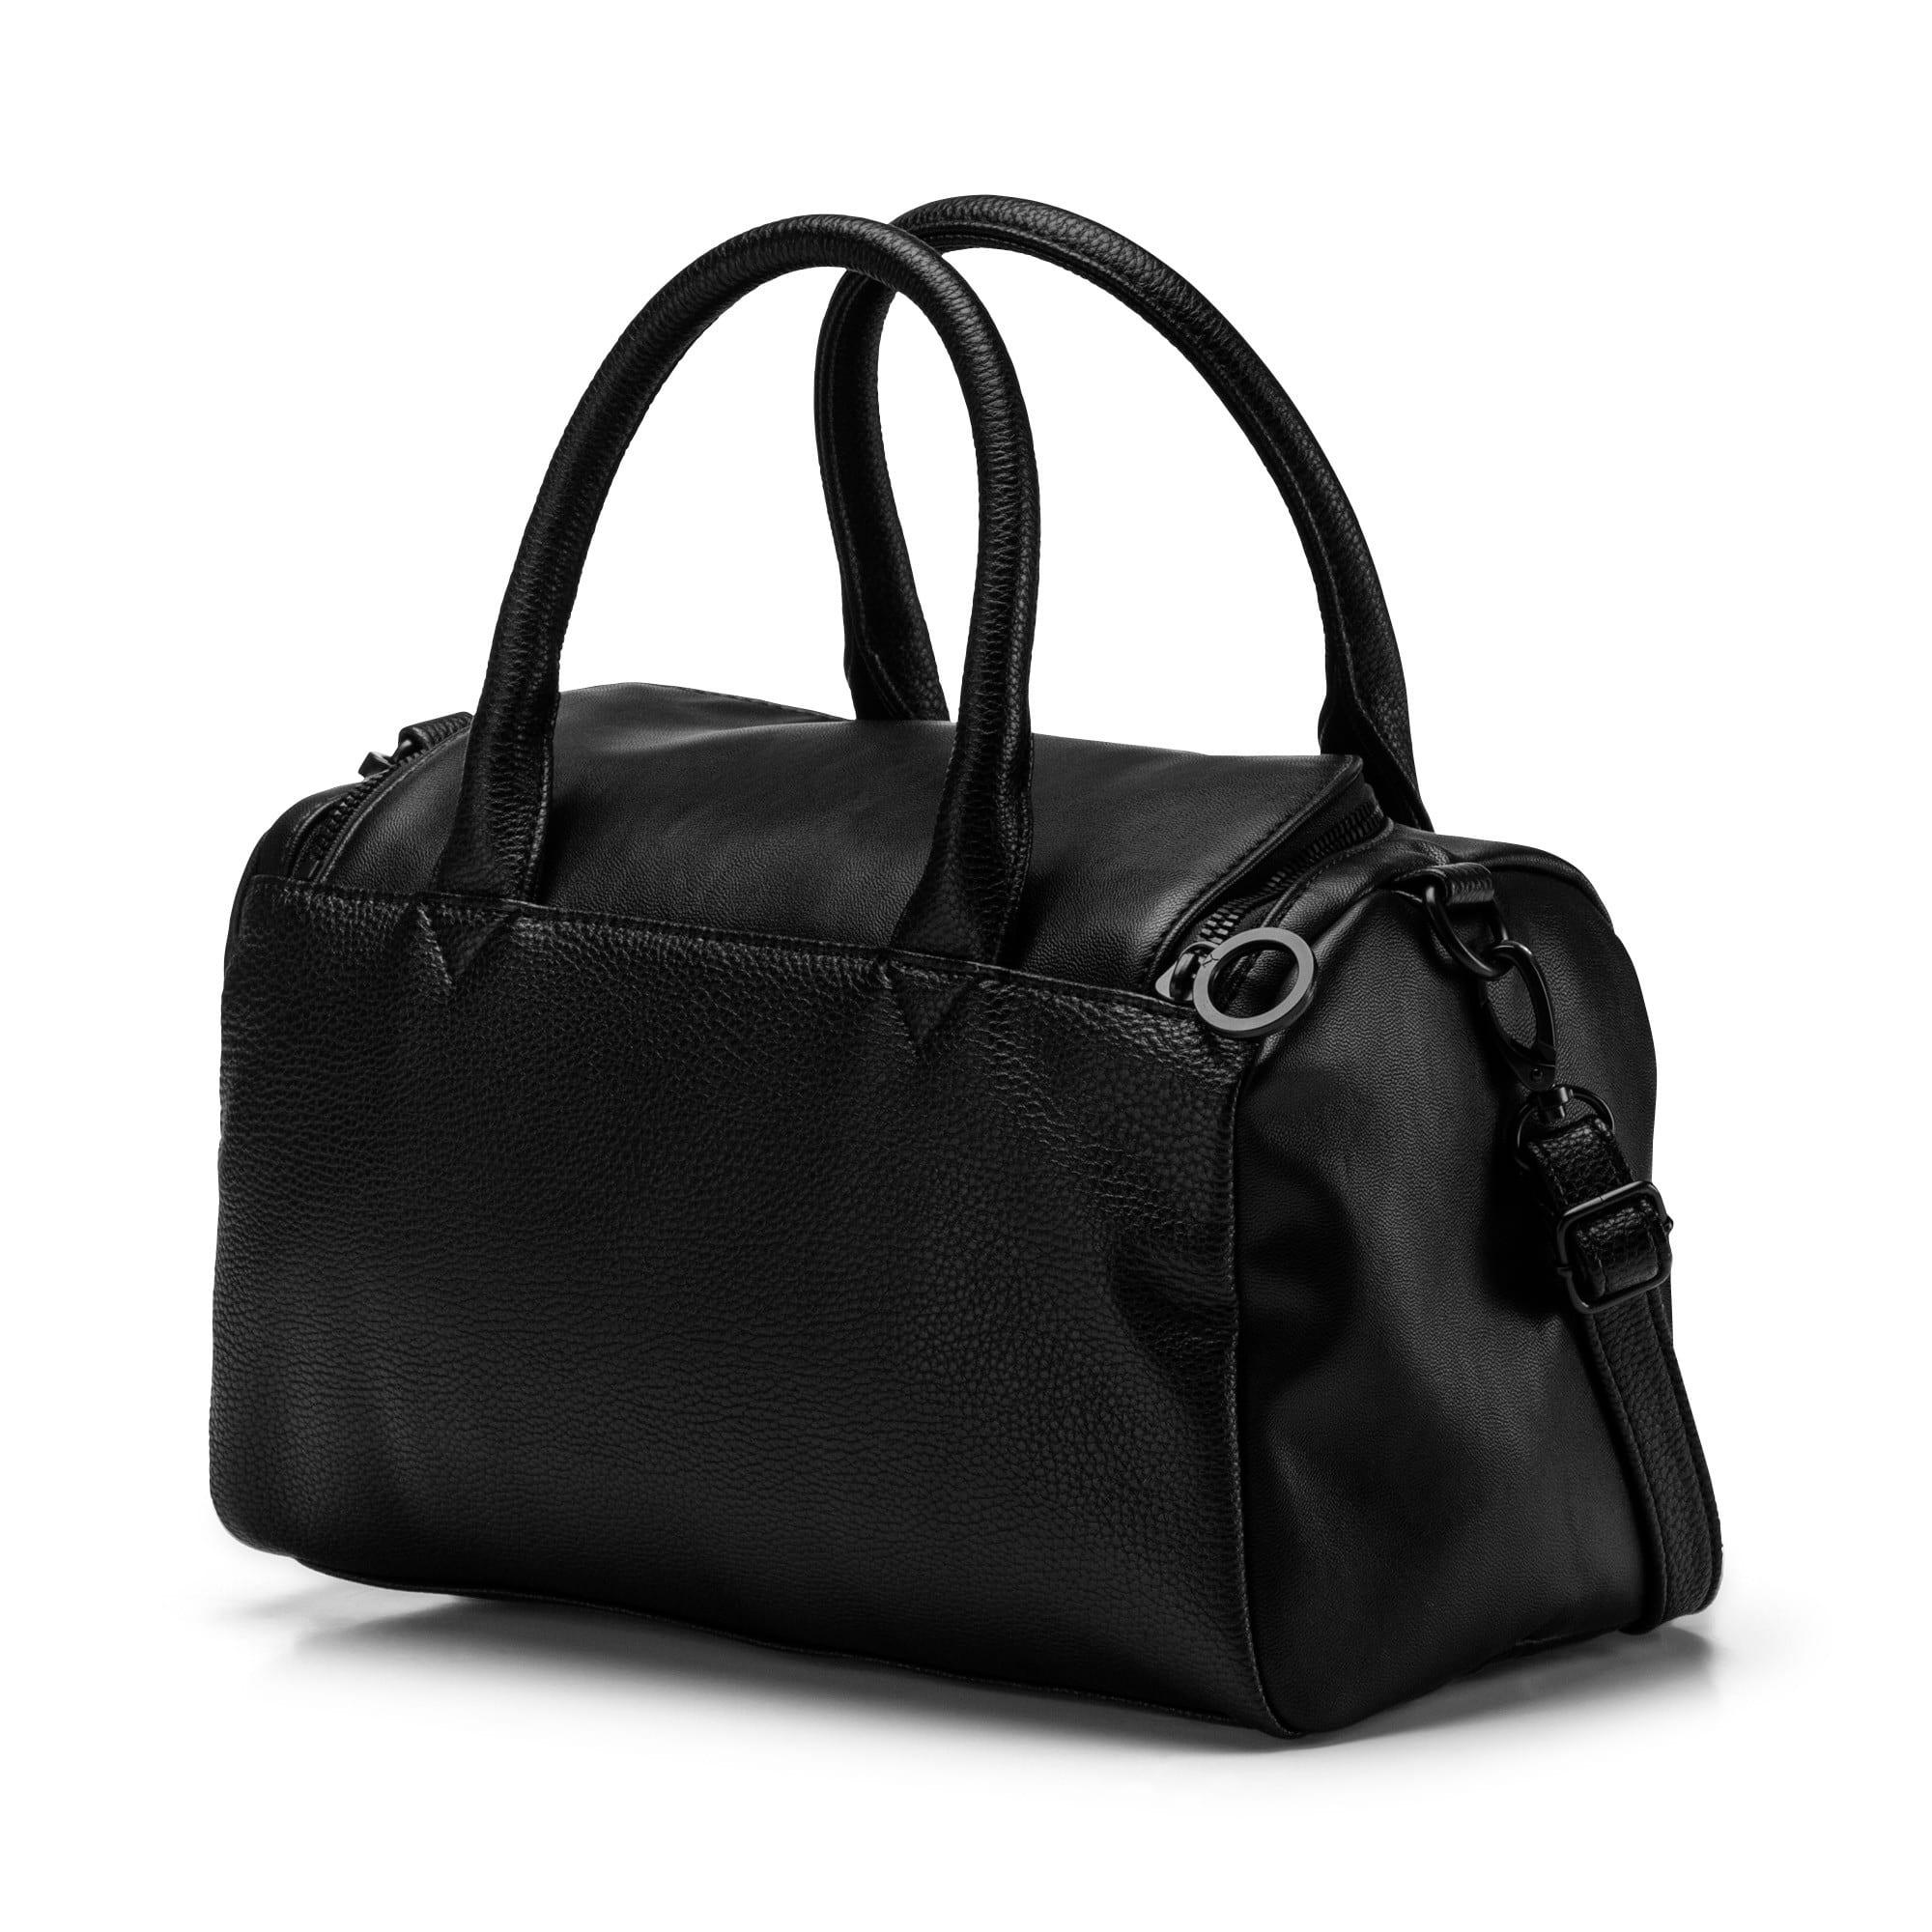 Thumbnail 2 of Ferrari Lifestyle Women's Handbag, Puma Black, medium